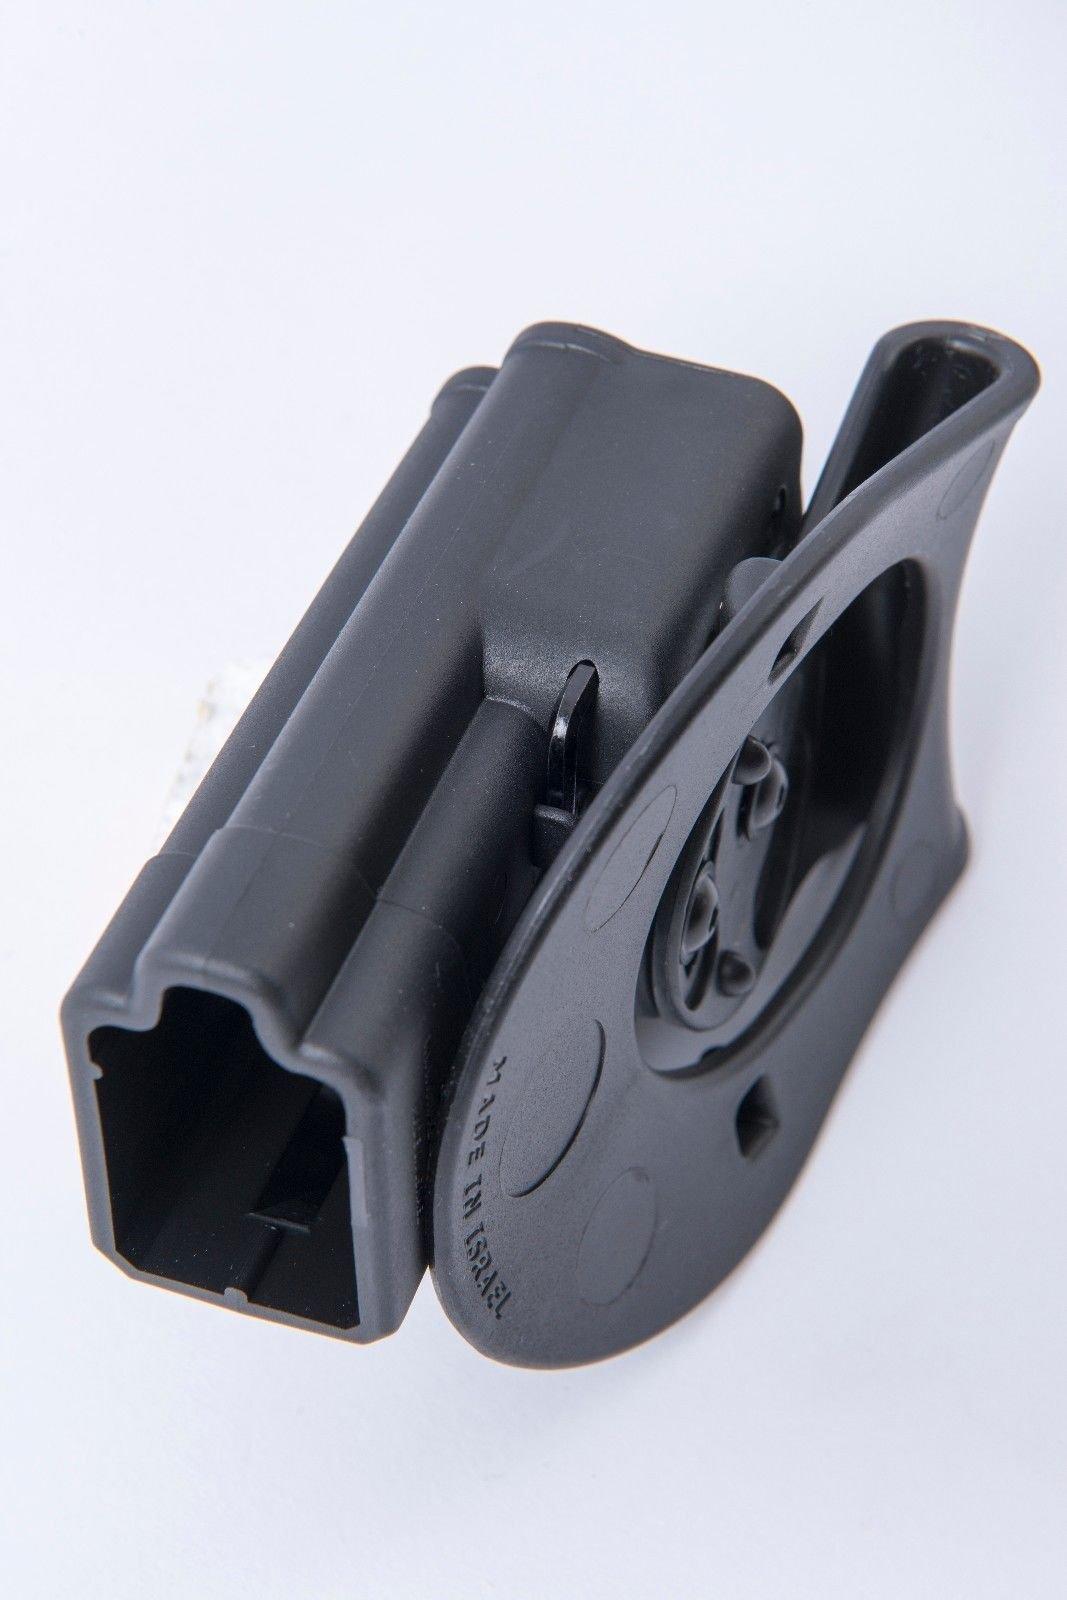 Orpaz Glock Gun Professional Holster Polymer With 360 Rotation Paddle & Belt Adjustment Screw For Models 17/19/22/23/25/26/31/32/34/35